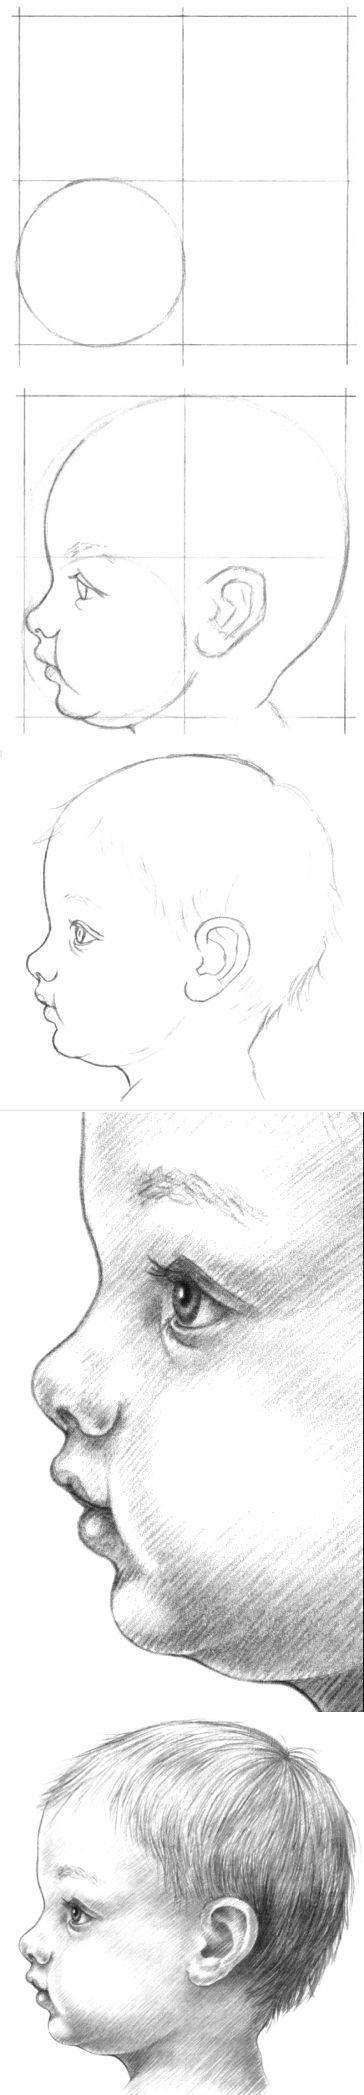 Рисуем лицо младенца: пошаговый урок